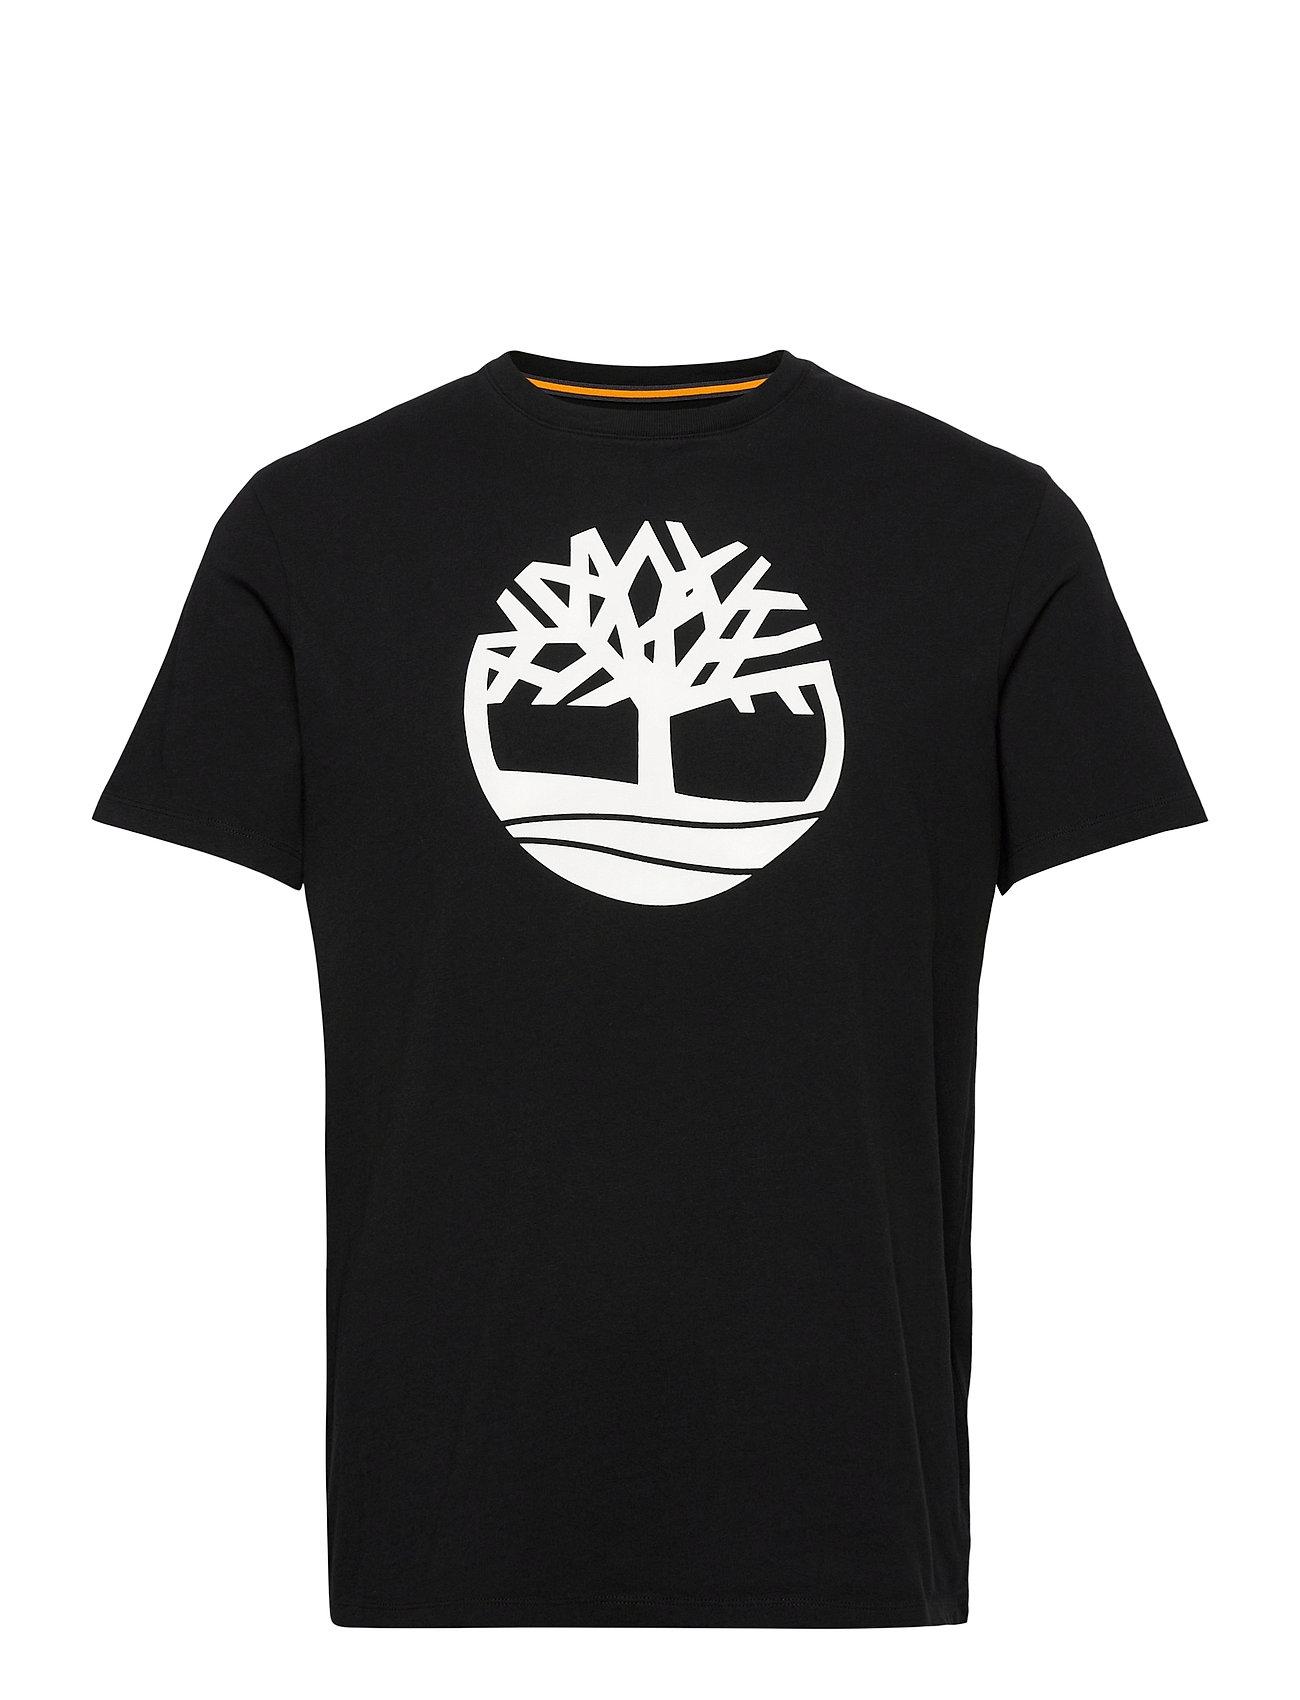 Kbec River Tree Tee T-shirt Sort Timberland